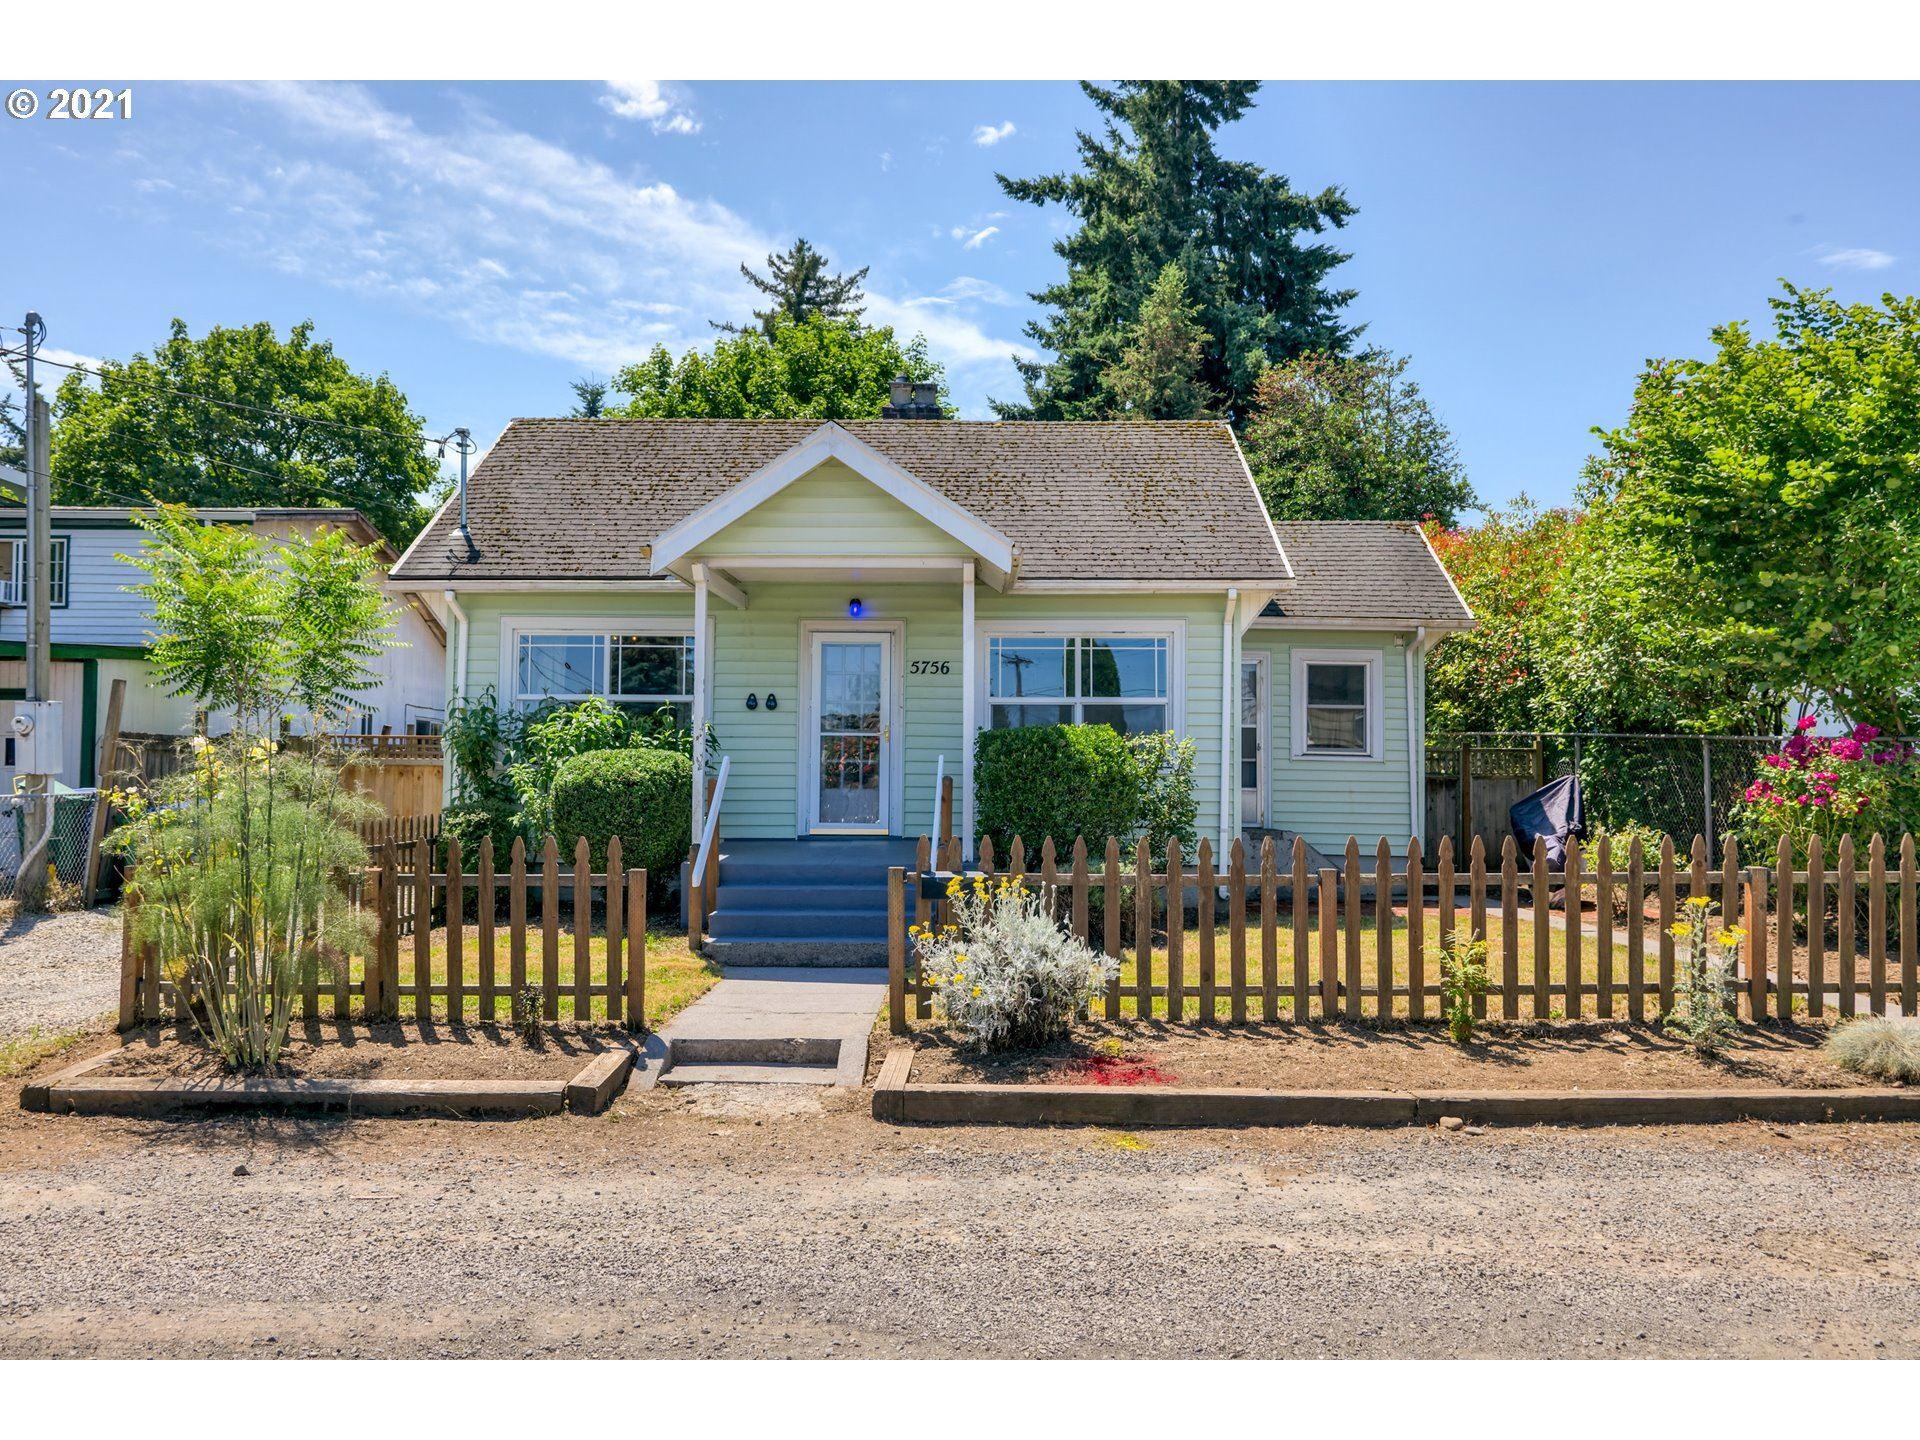 5756 NE SHAVER ST, Portland, OR 97213 - MLS#: 21475228